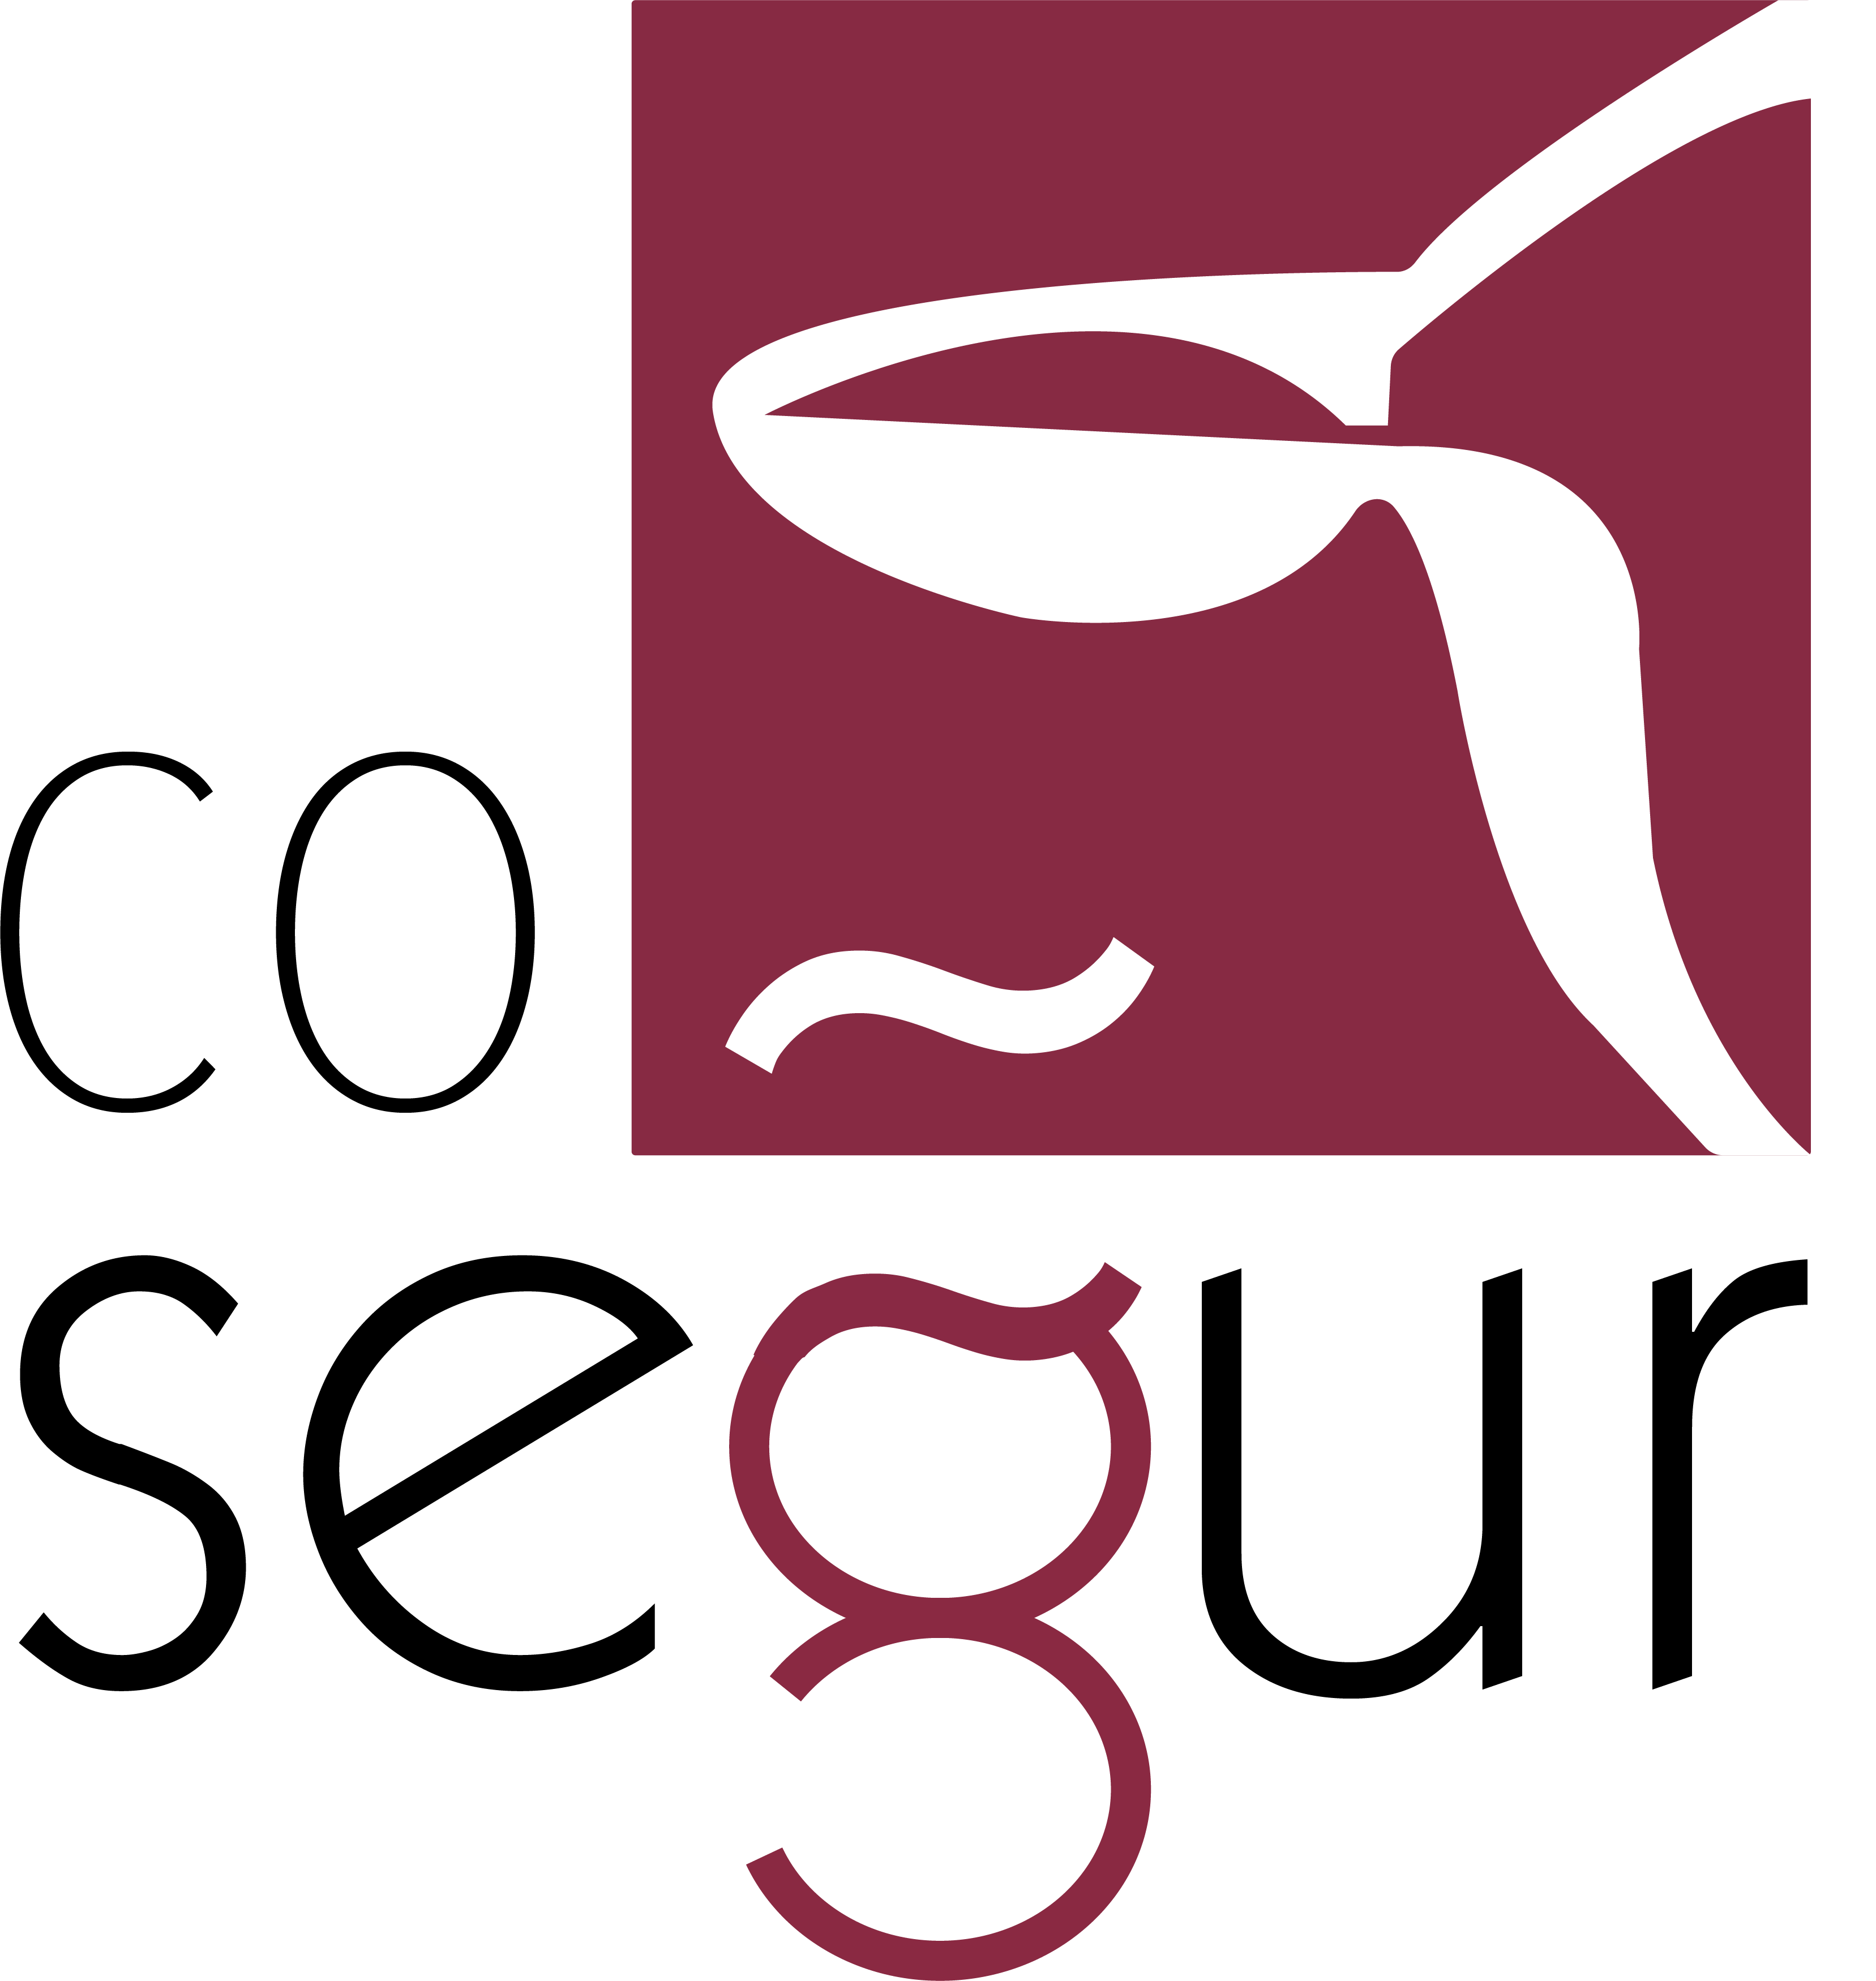 Logo Cosegur - Sabor Granada